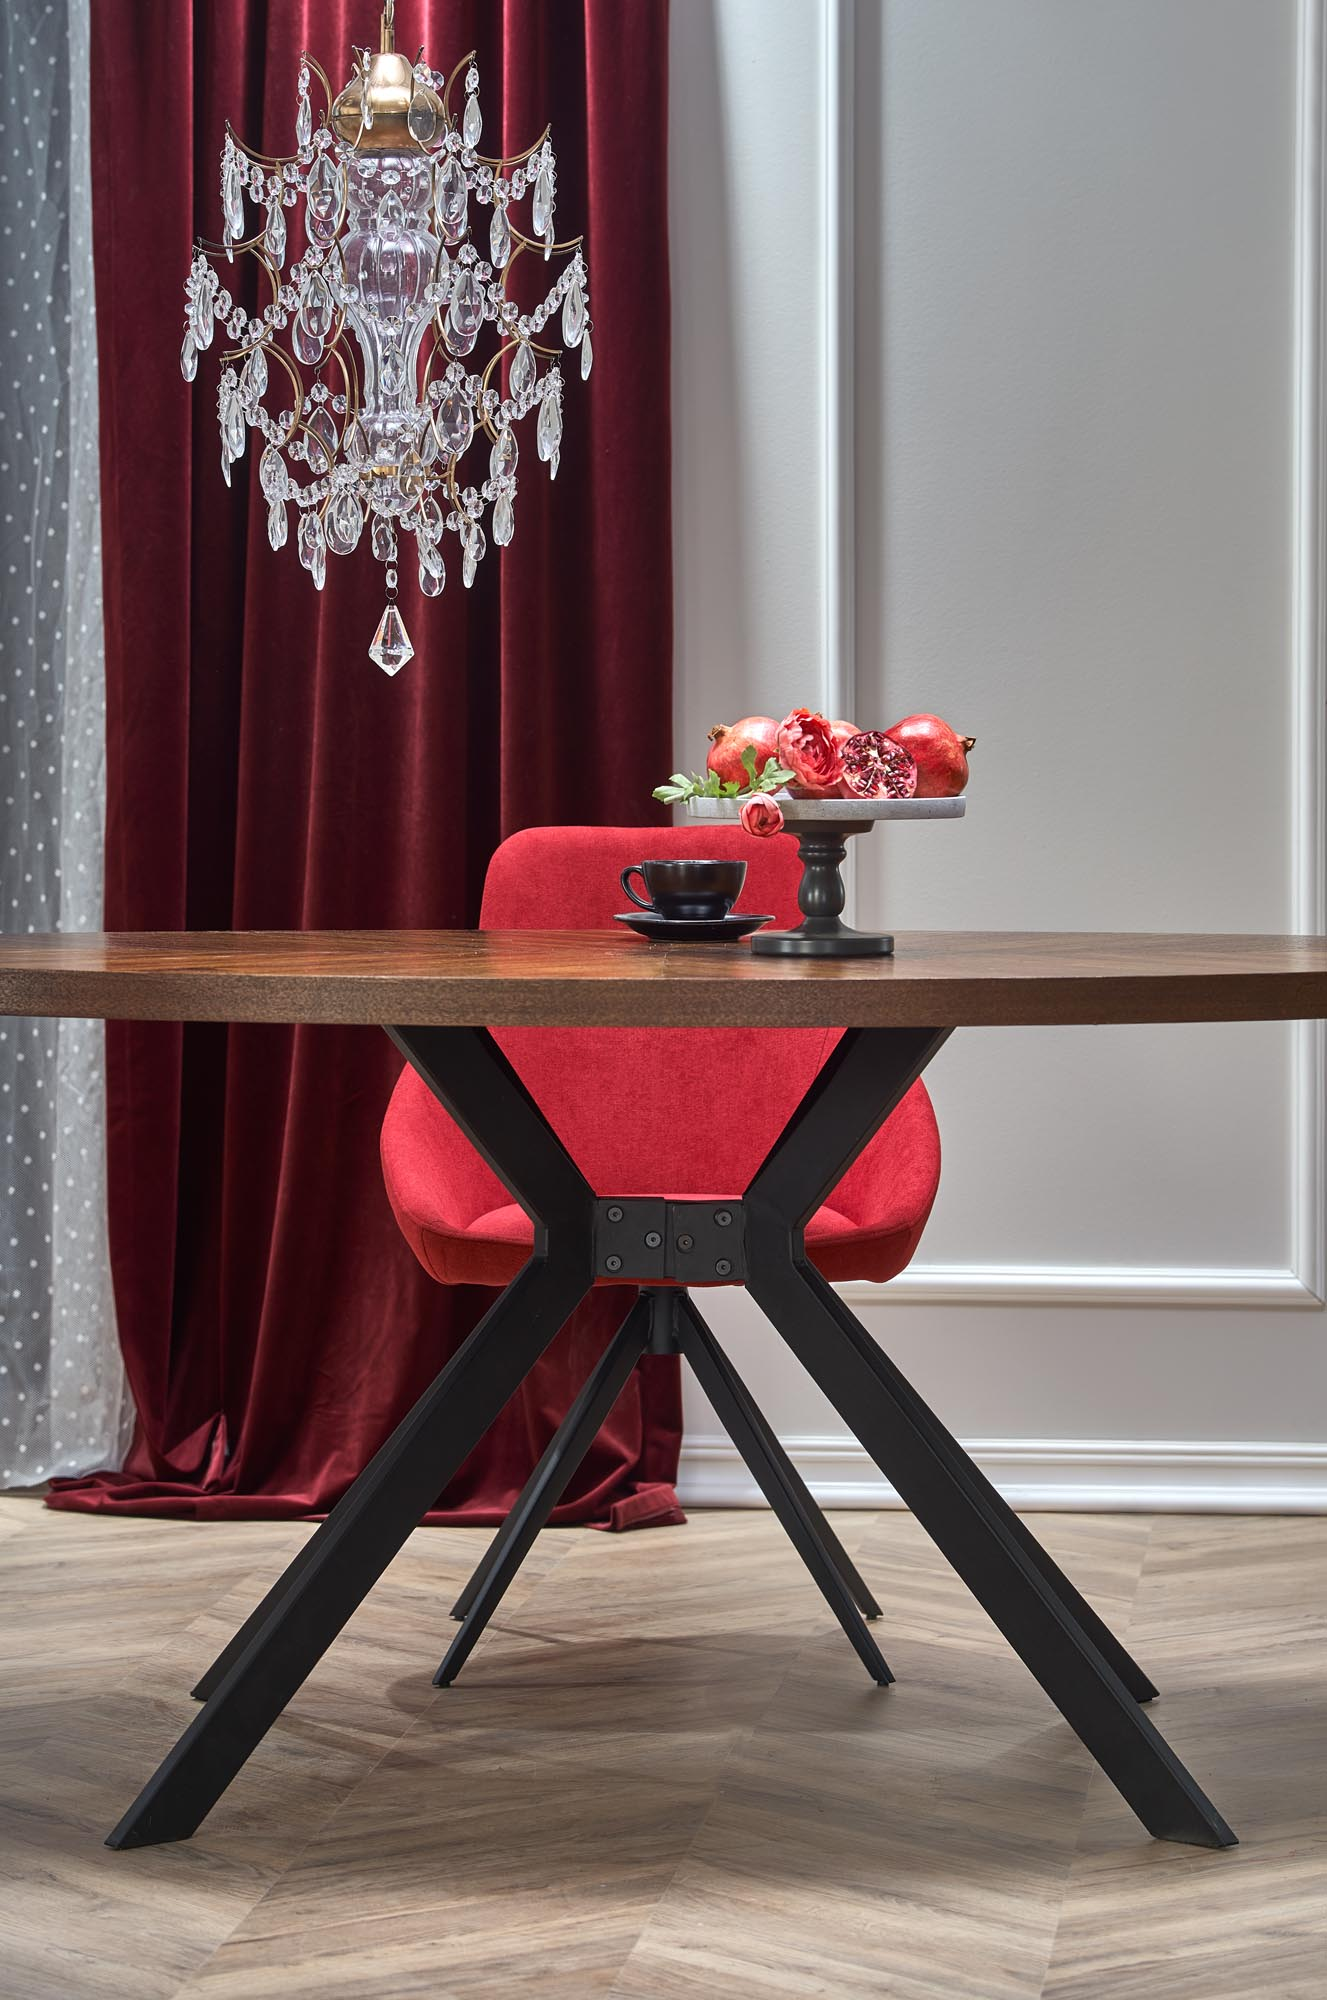 LOCARNO stôl, doska - orech, nohy - čierne